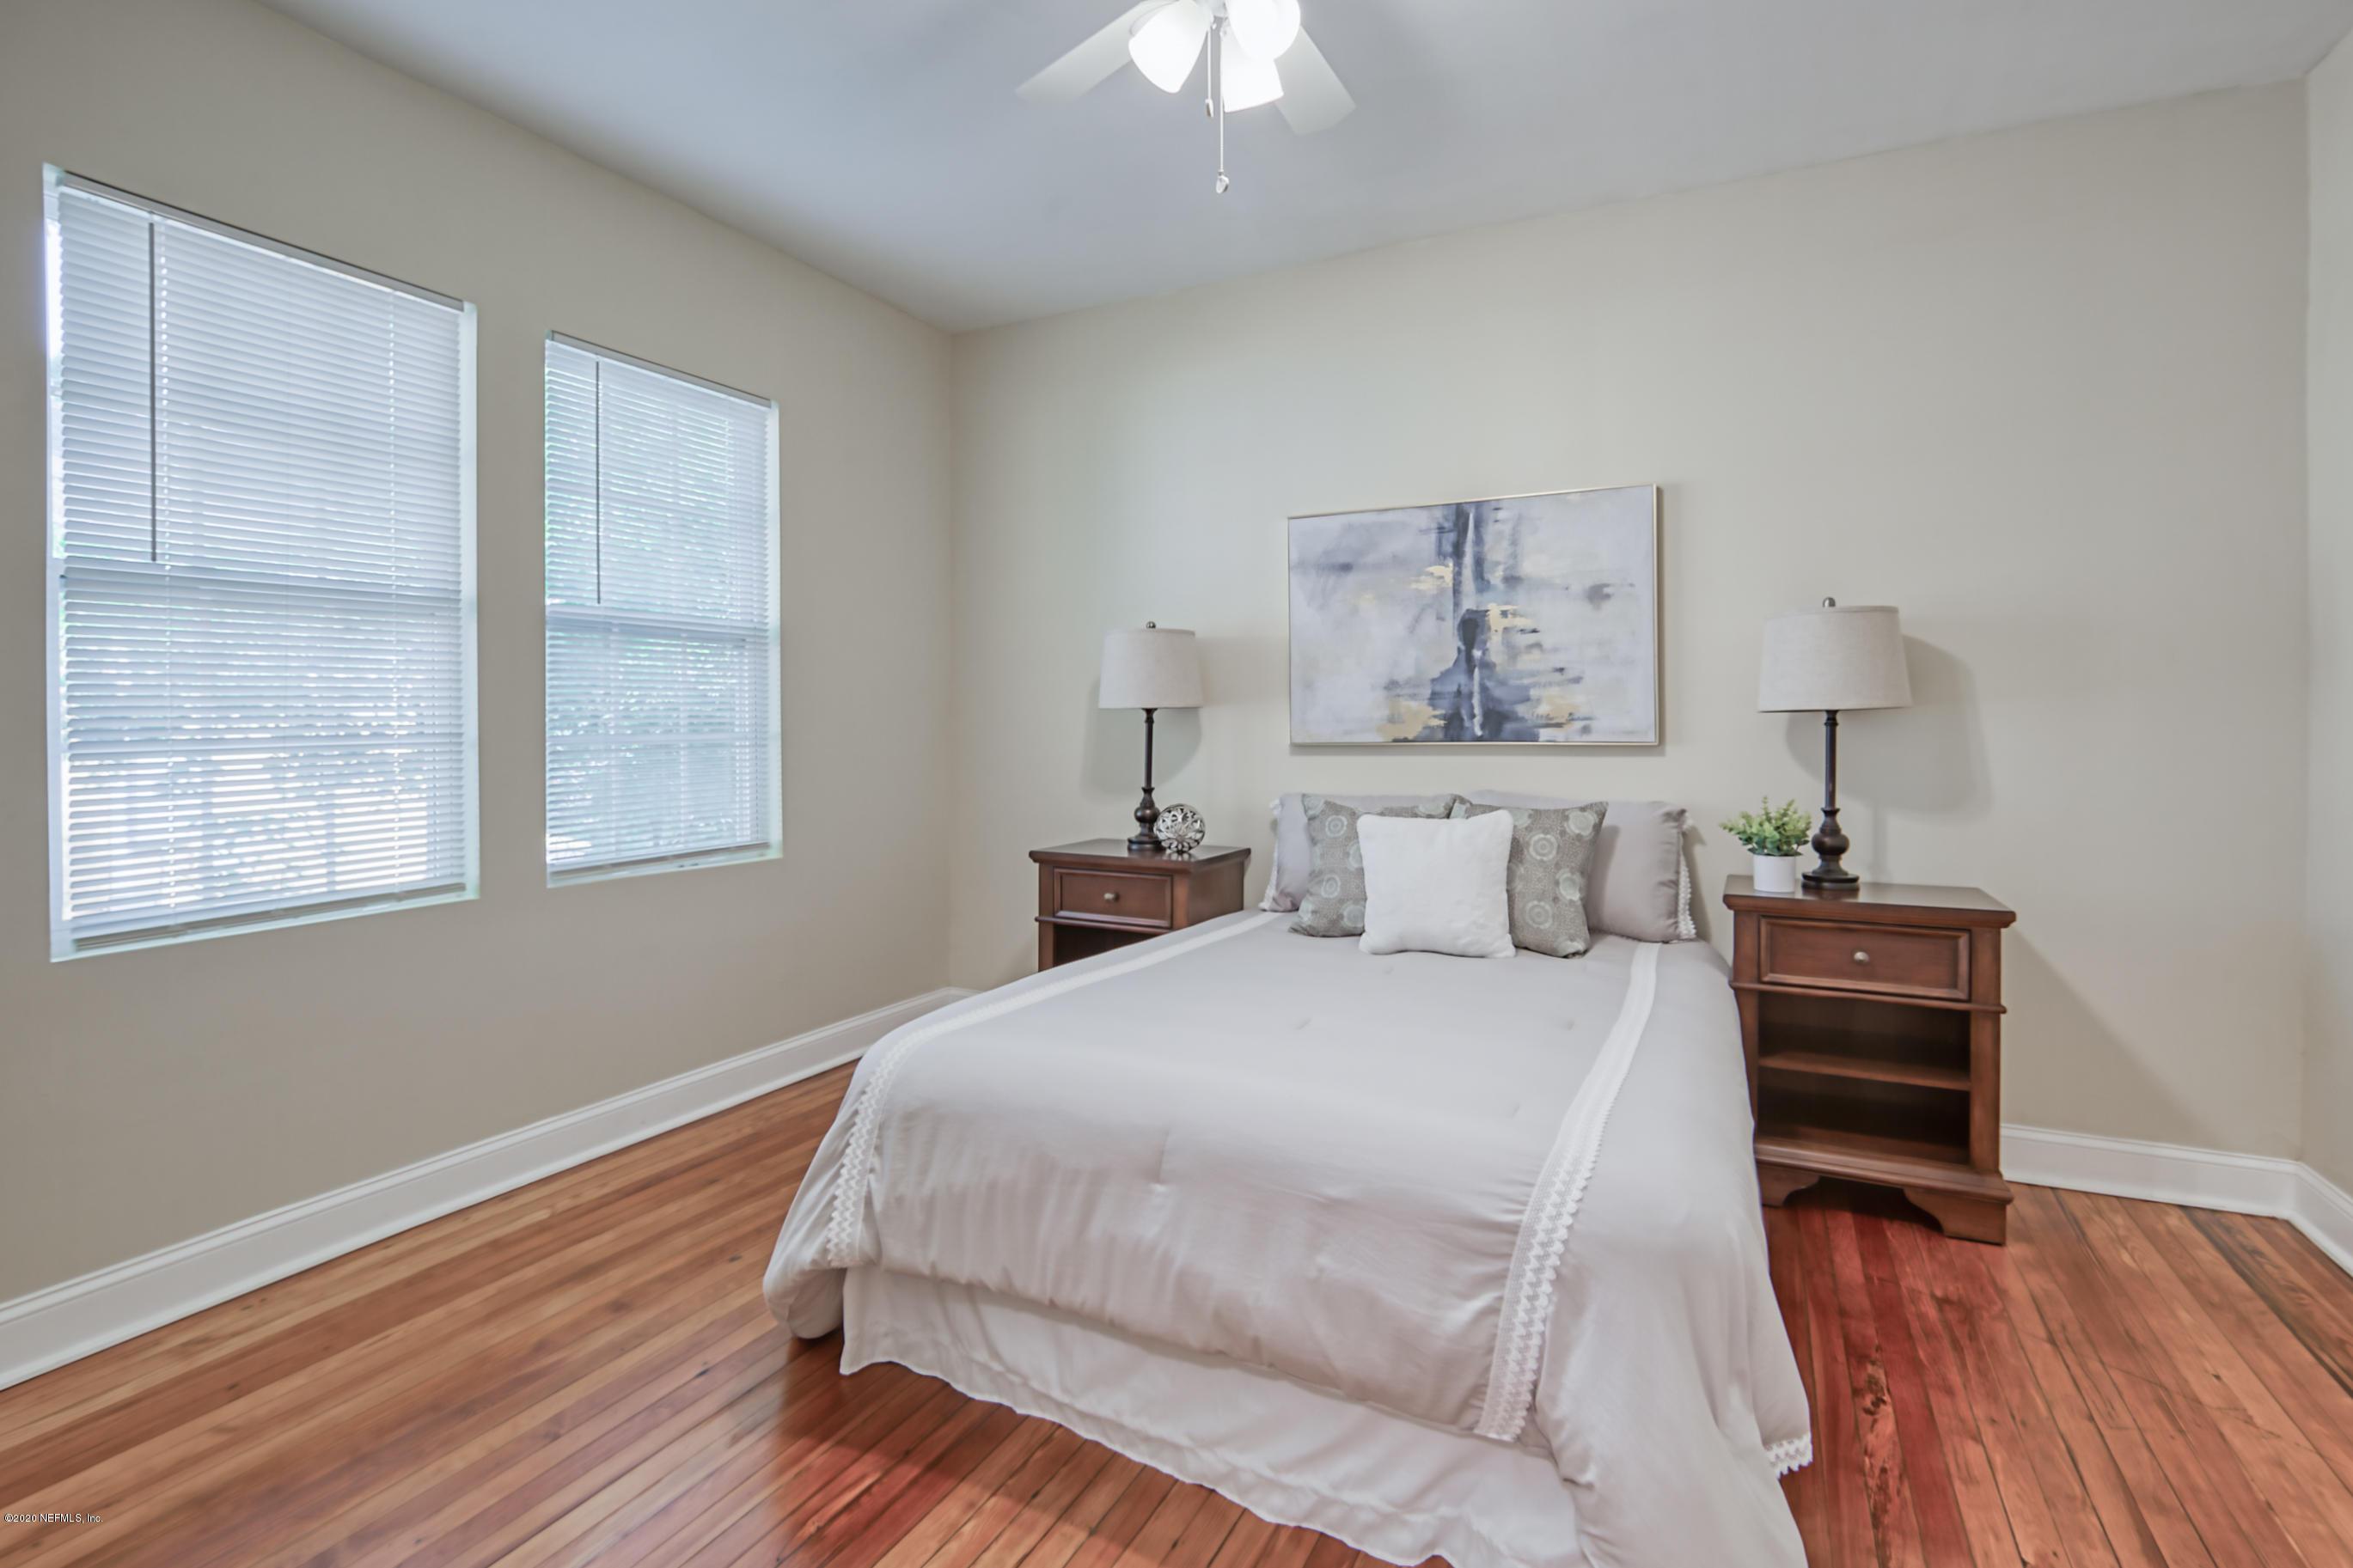 2679 ERNEST, JACKSONVILLE, FLORIDA 32204, 3 Bedrooms Bedrooms, ,1 BathroomBathrooms,Residential,For sale,ERNEST,1080216